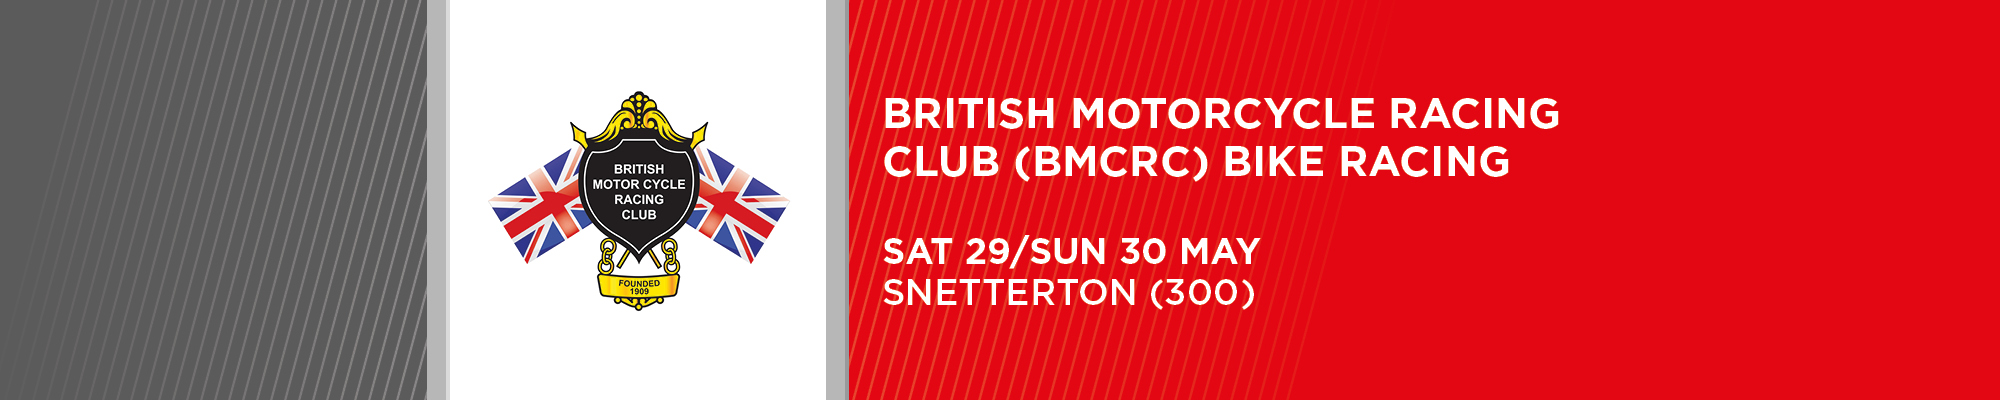 BMCRC-MRO 2021 Championships